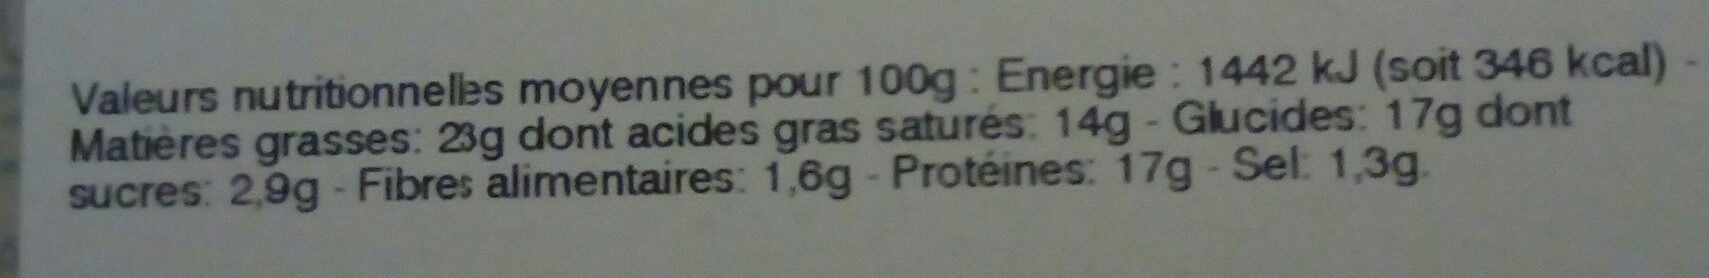 Gougeres gratinees fromage - Voedingswaarden